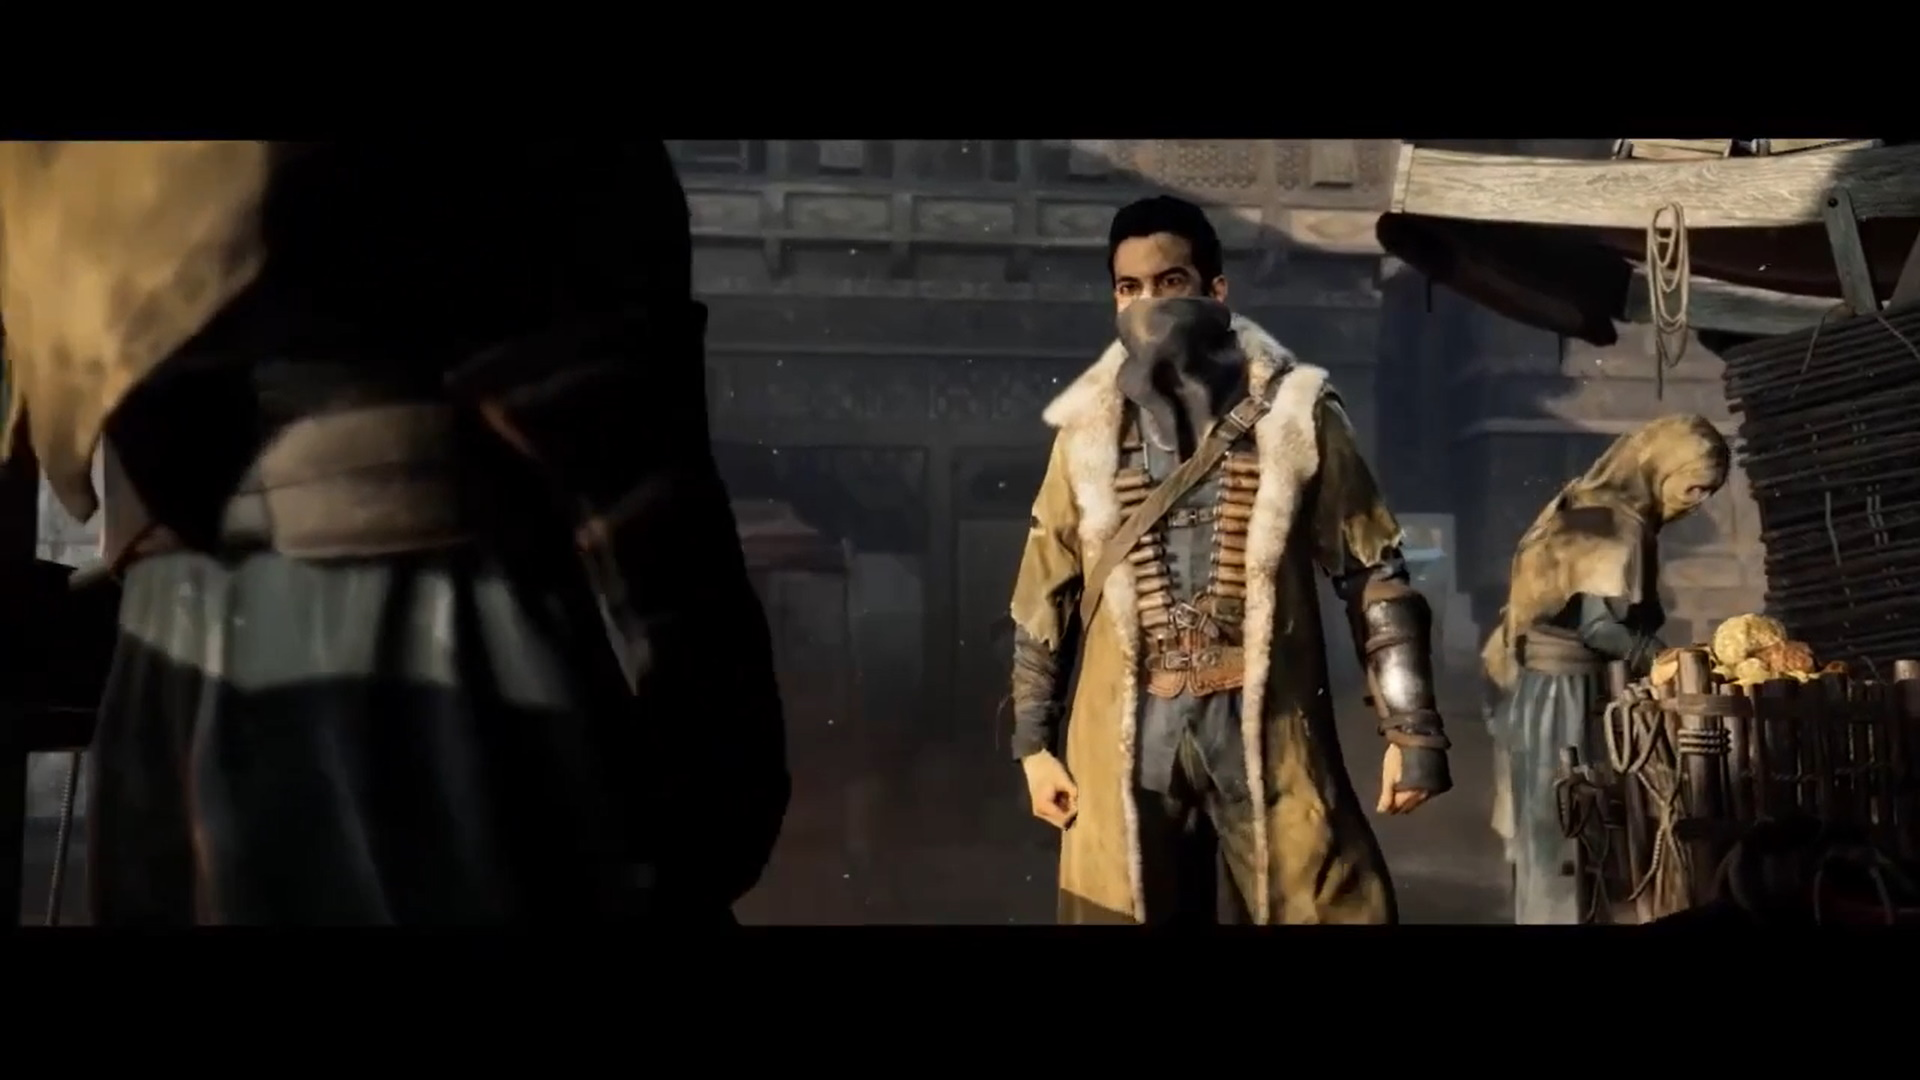 sucker-punch-prophecy-gameplay-footage-leaked.jpg